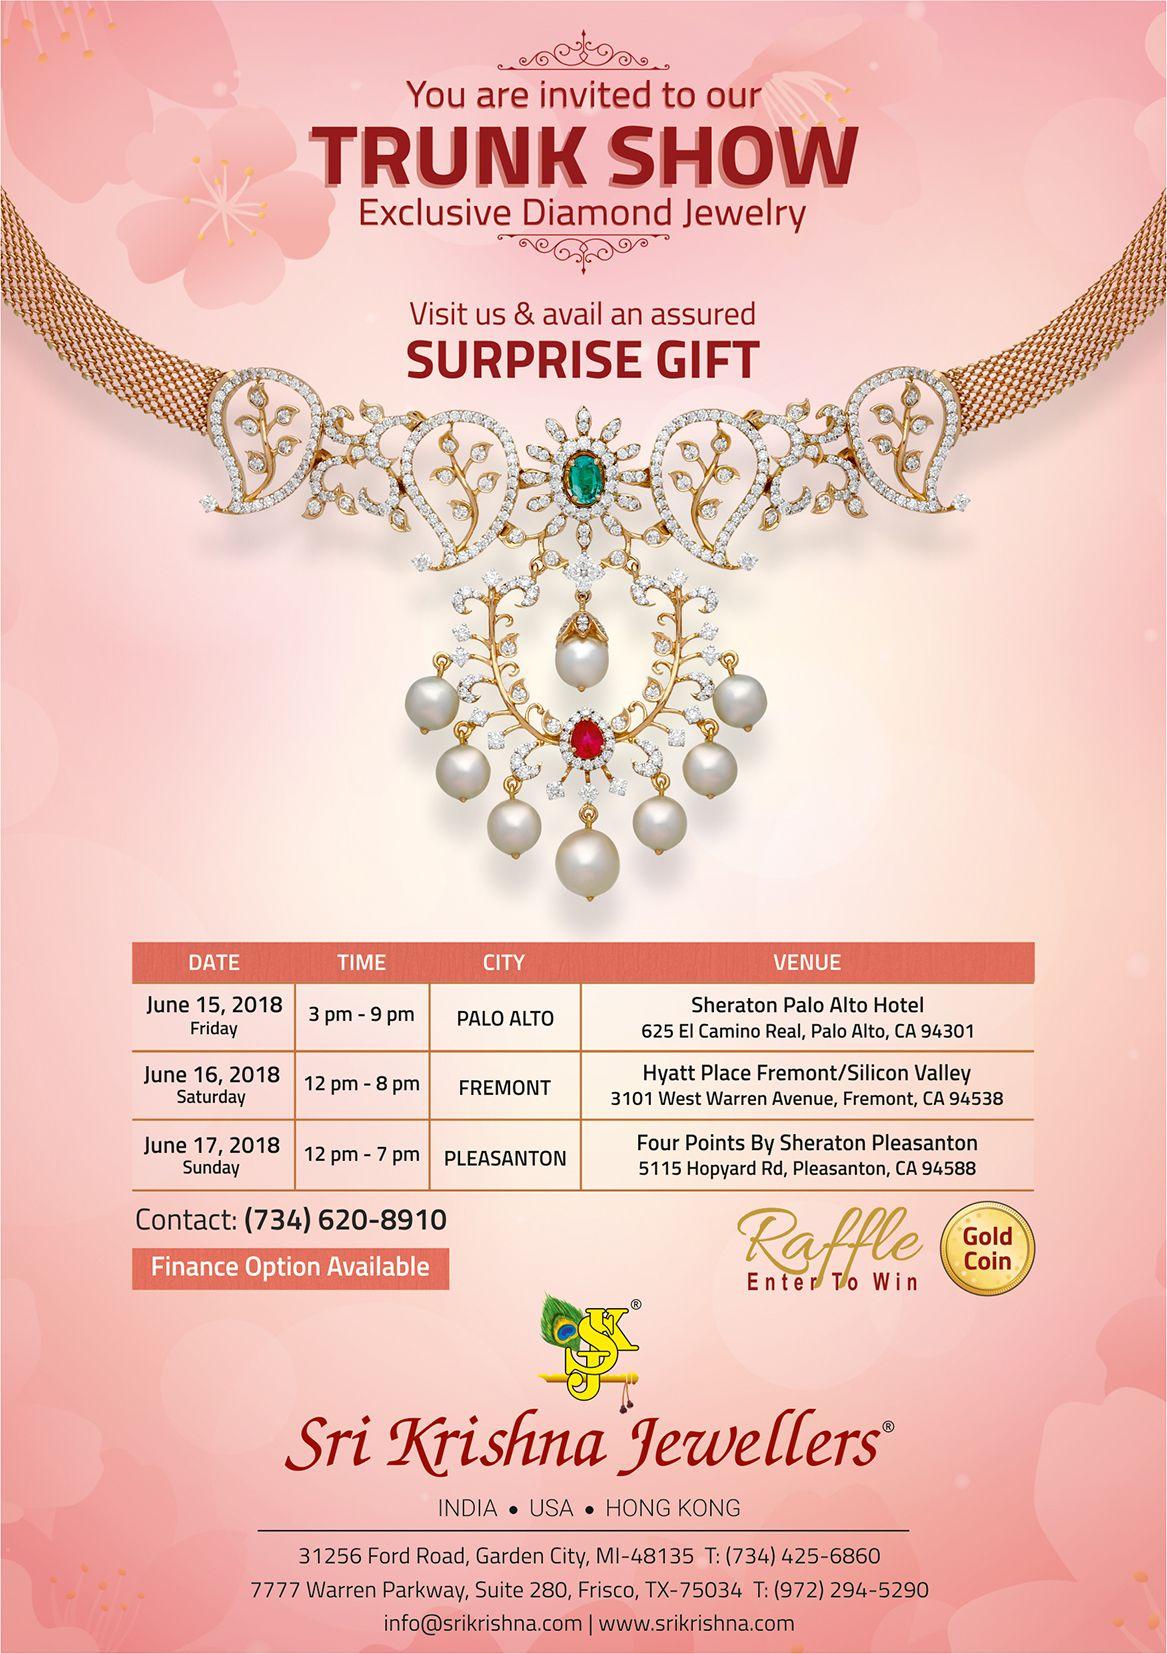 Sri Krishna Jewellers - Trunk Show in California: Exclusive Diamond Jewelry